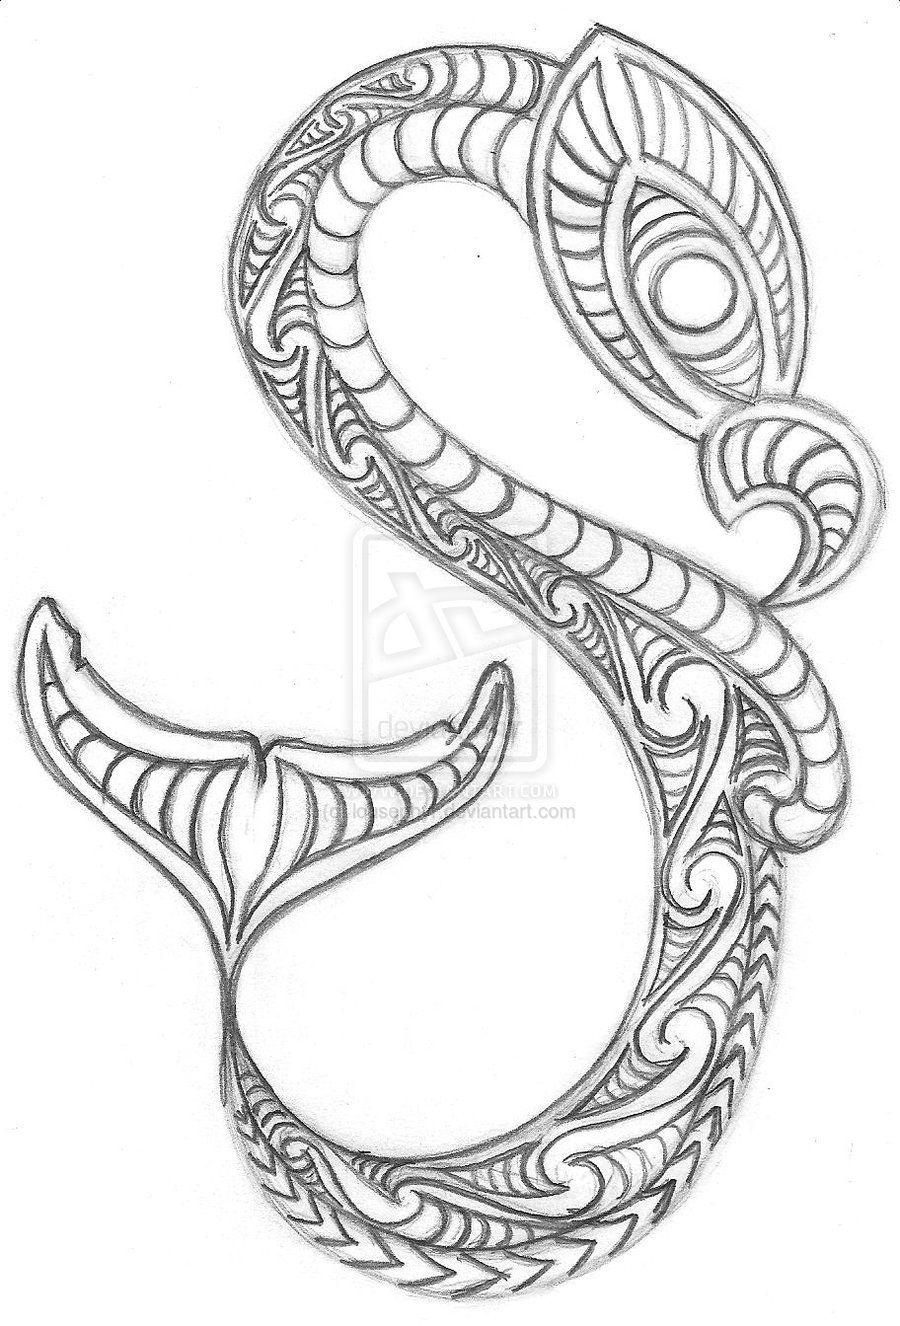 044569dad Manaia ;Maori spiritual guardian of Sky, Land Sea; by  lousephyr.deviantart.com on @deviantART